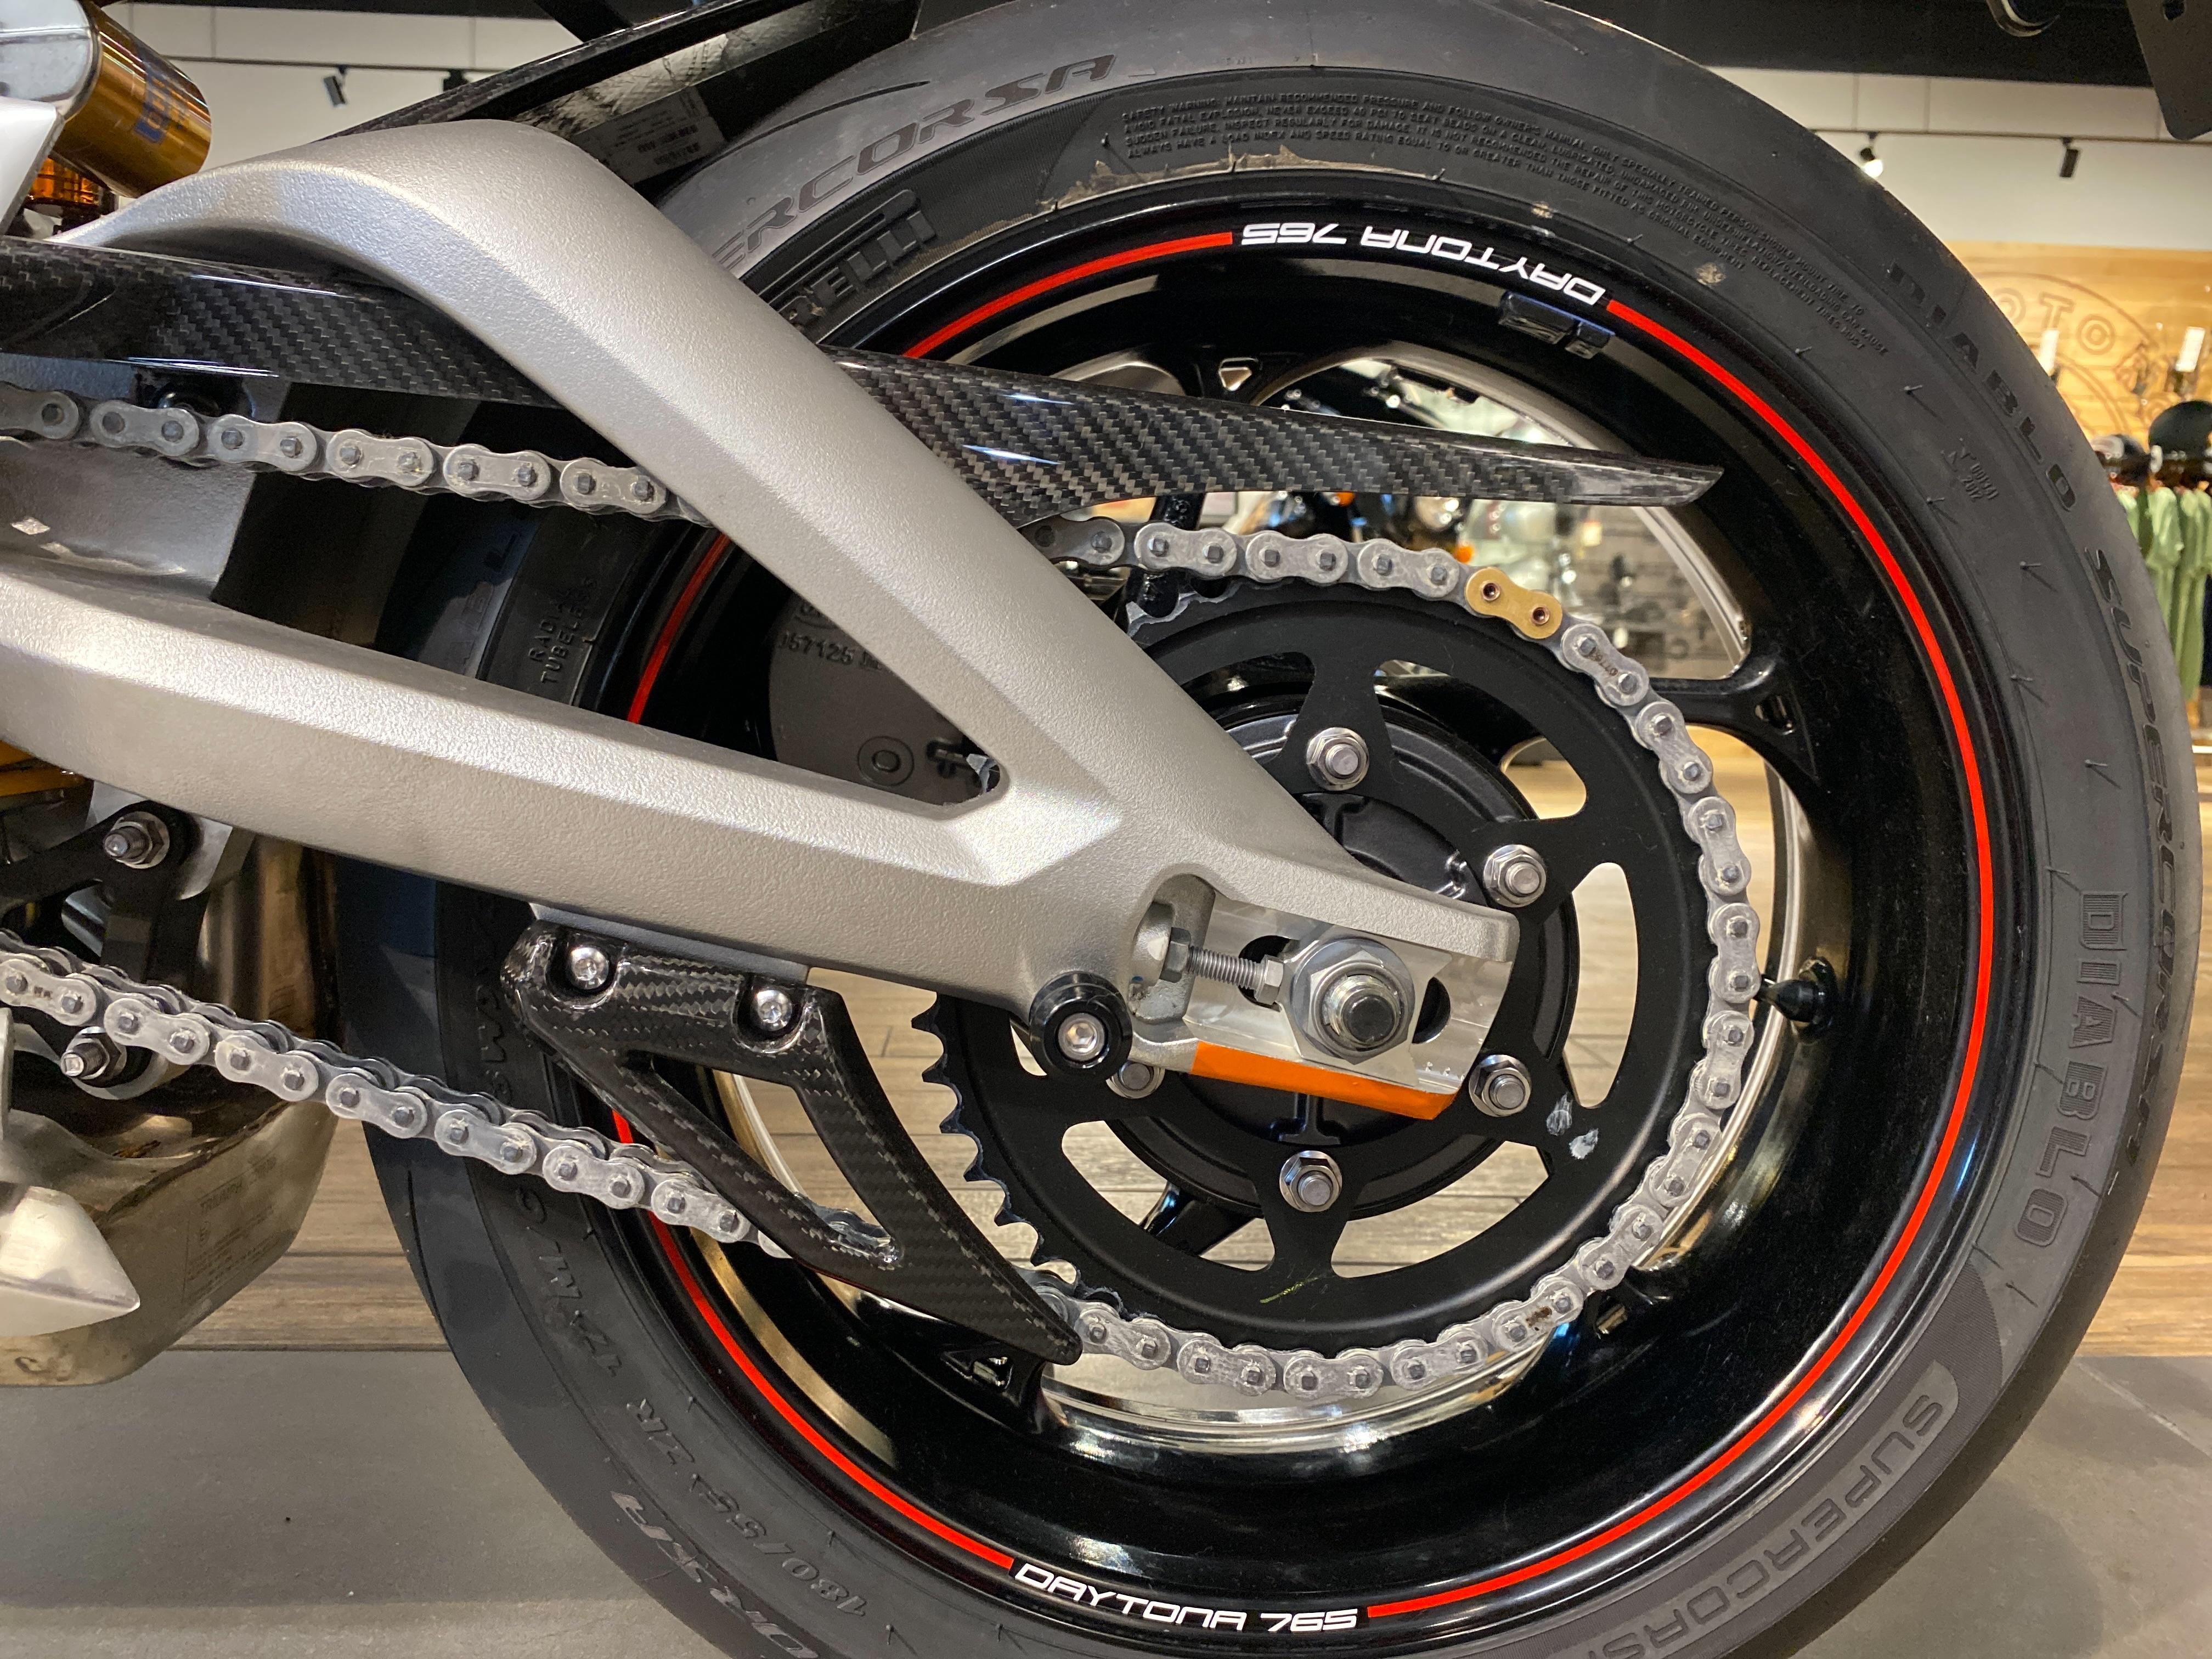 2020 Triumph Daytona Moto2 765 at Frontline Eurosports